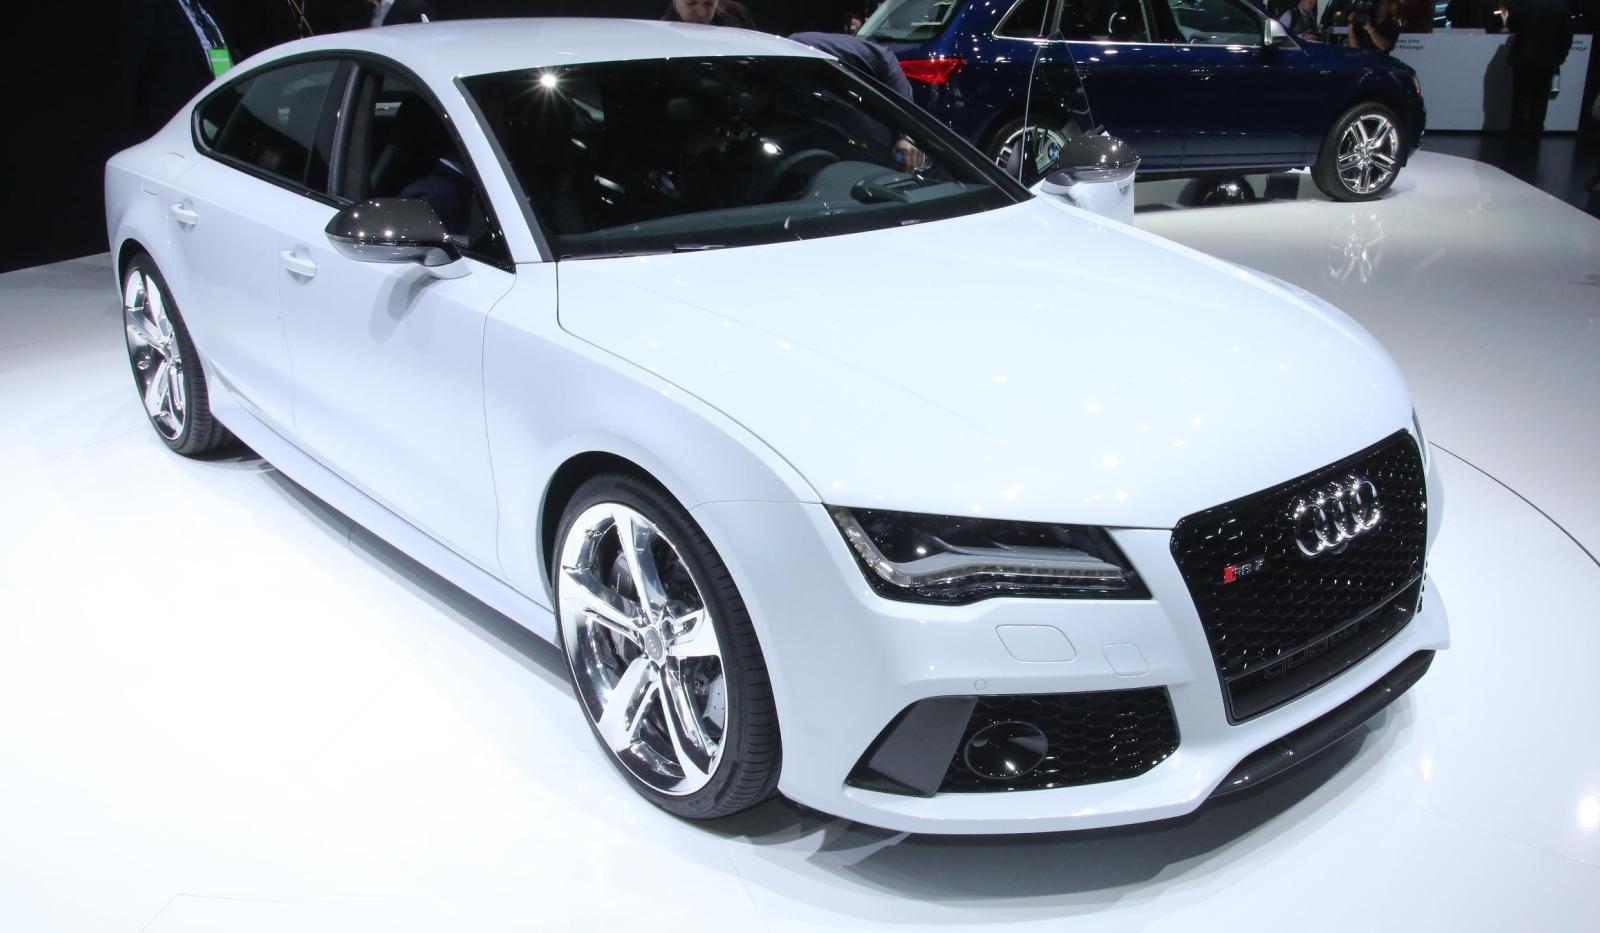 Detroit 2013: Audi RS7 Sportback